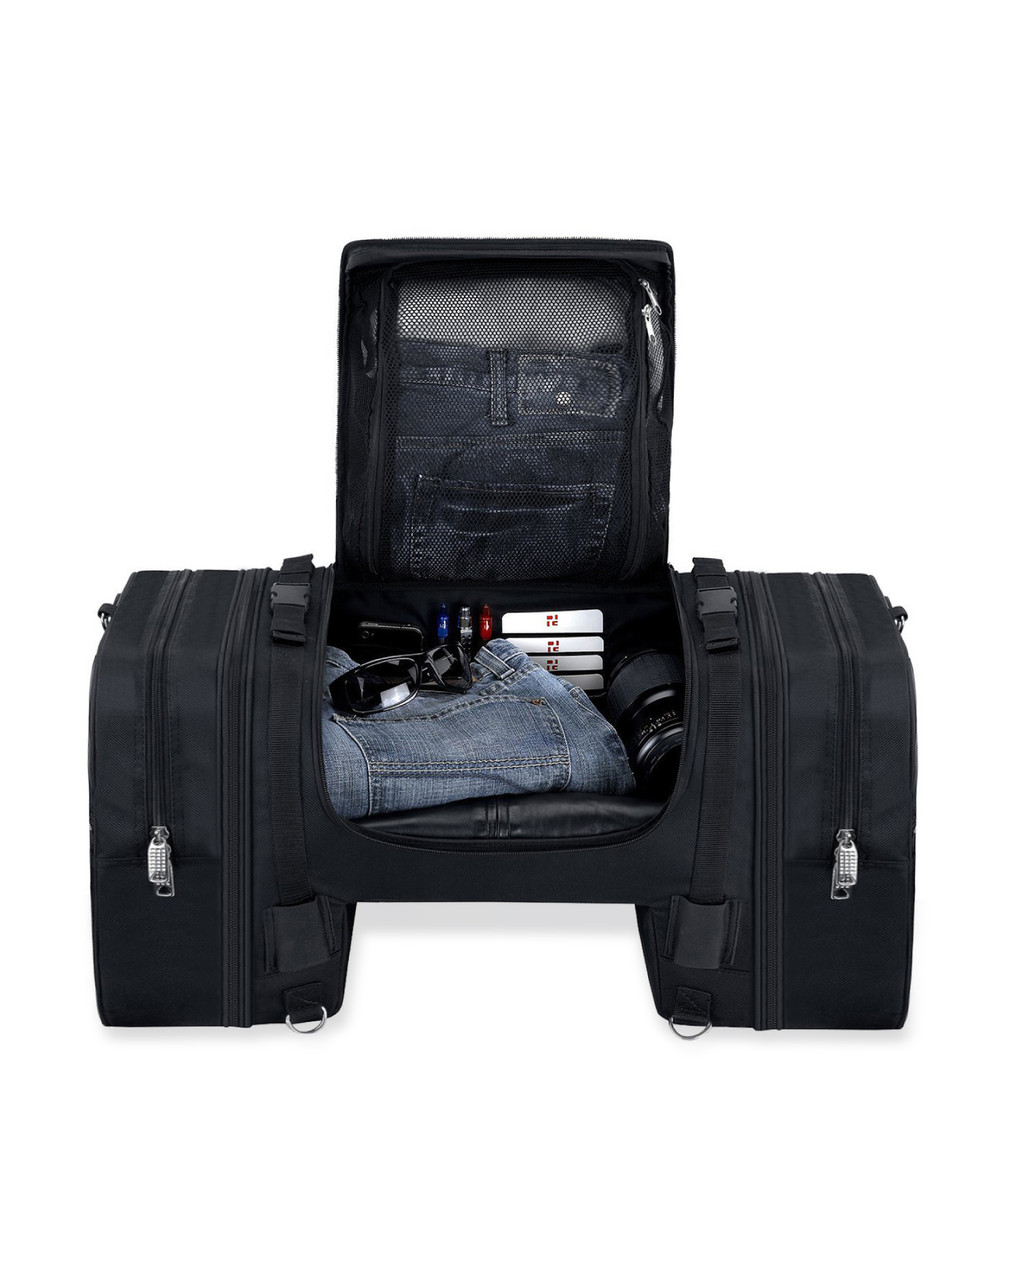 Kawasaki Viking Expandable Cruiser Motorcycle Tail Bag Storage View